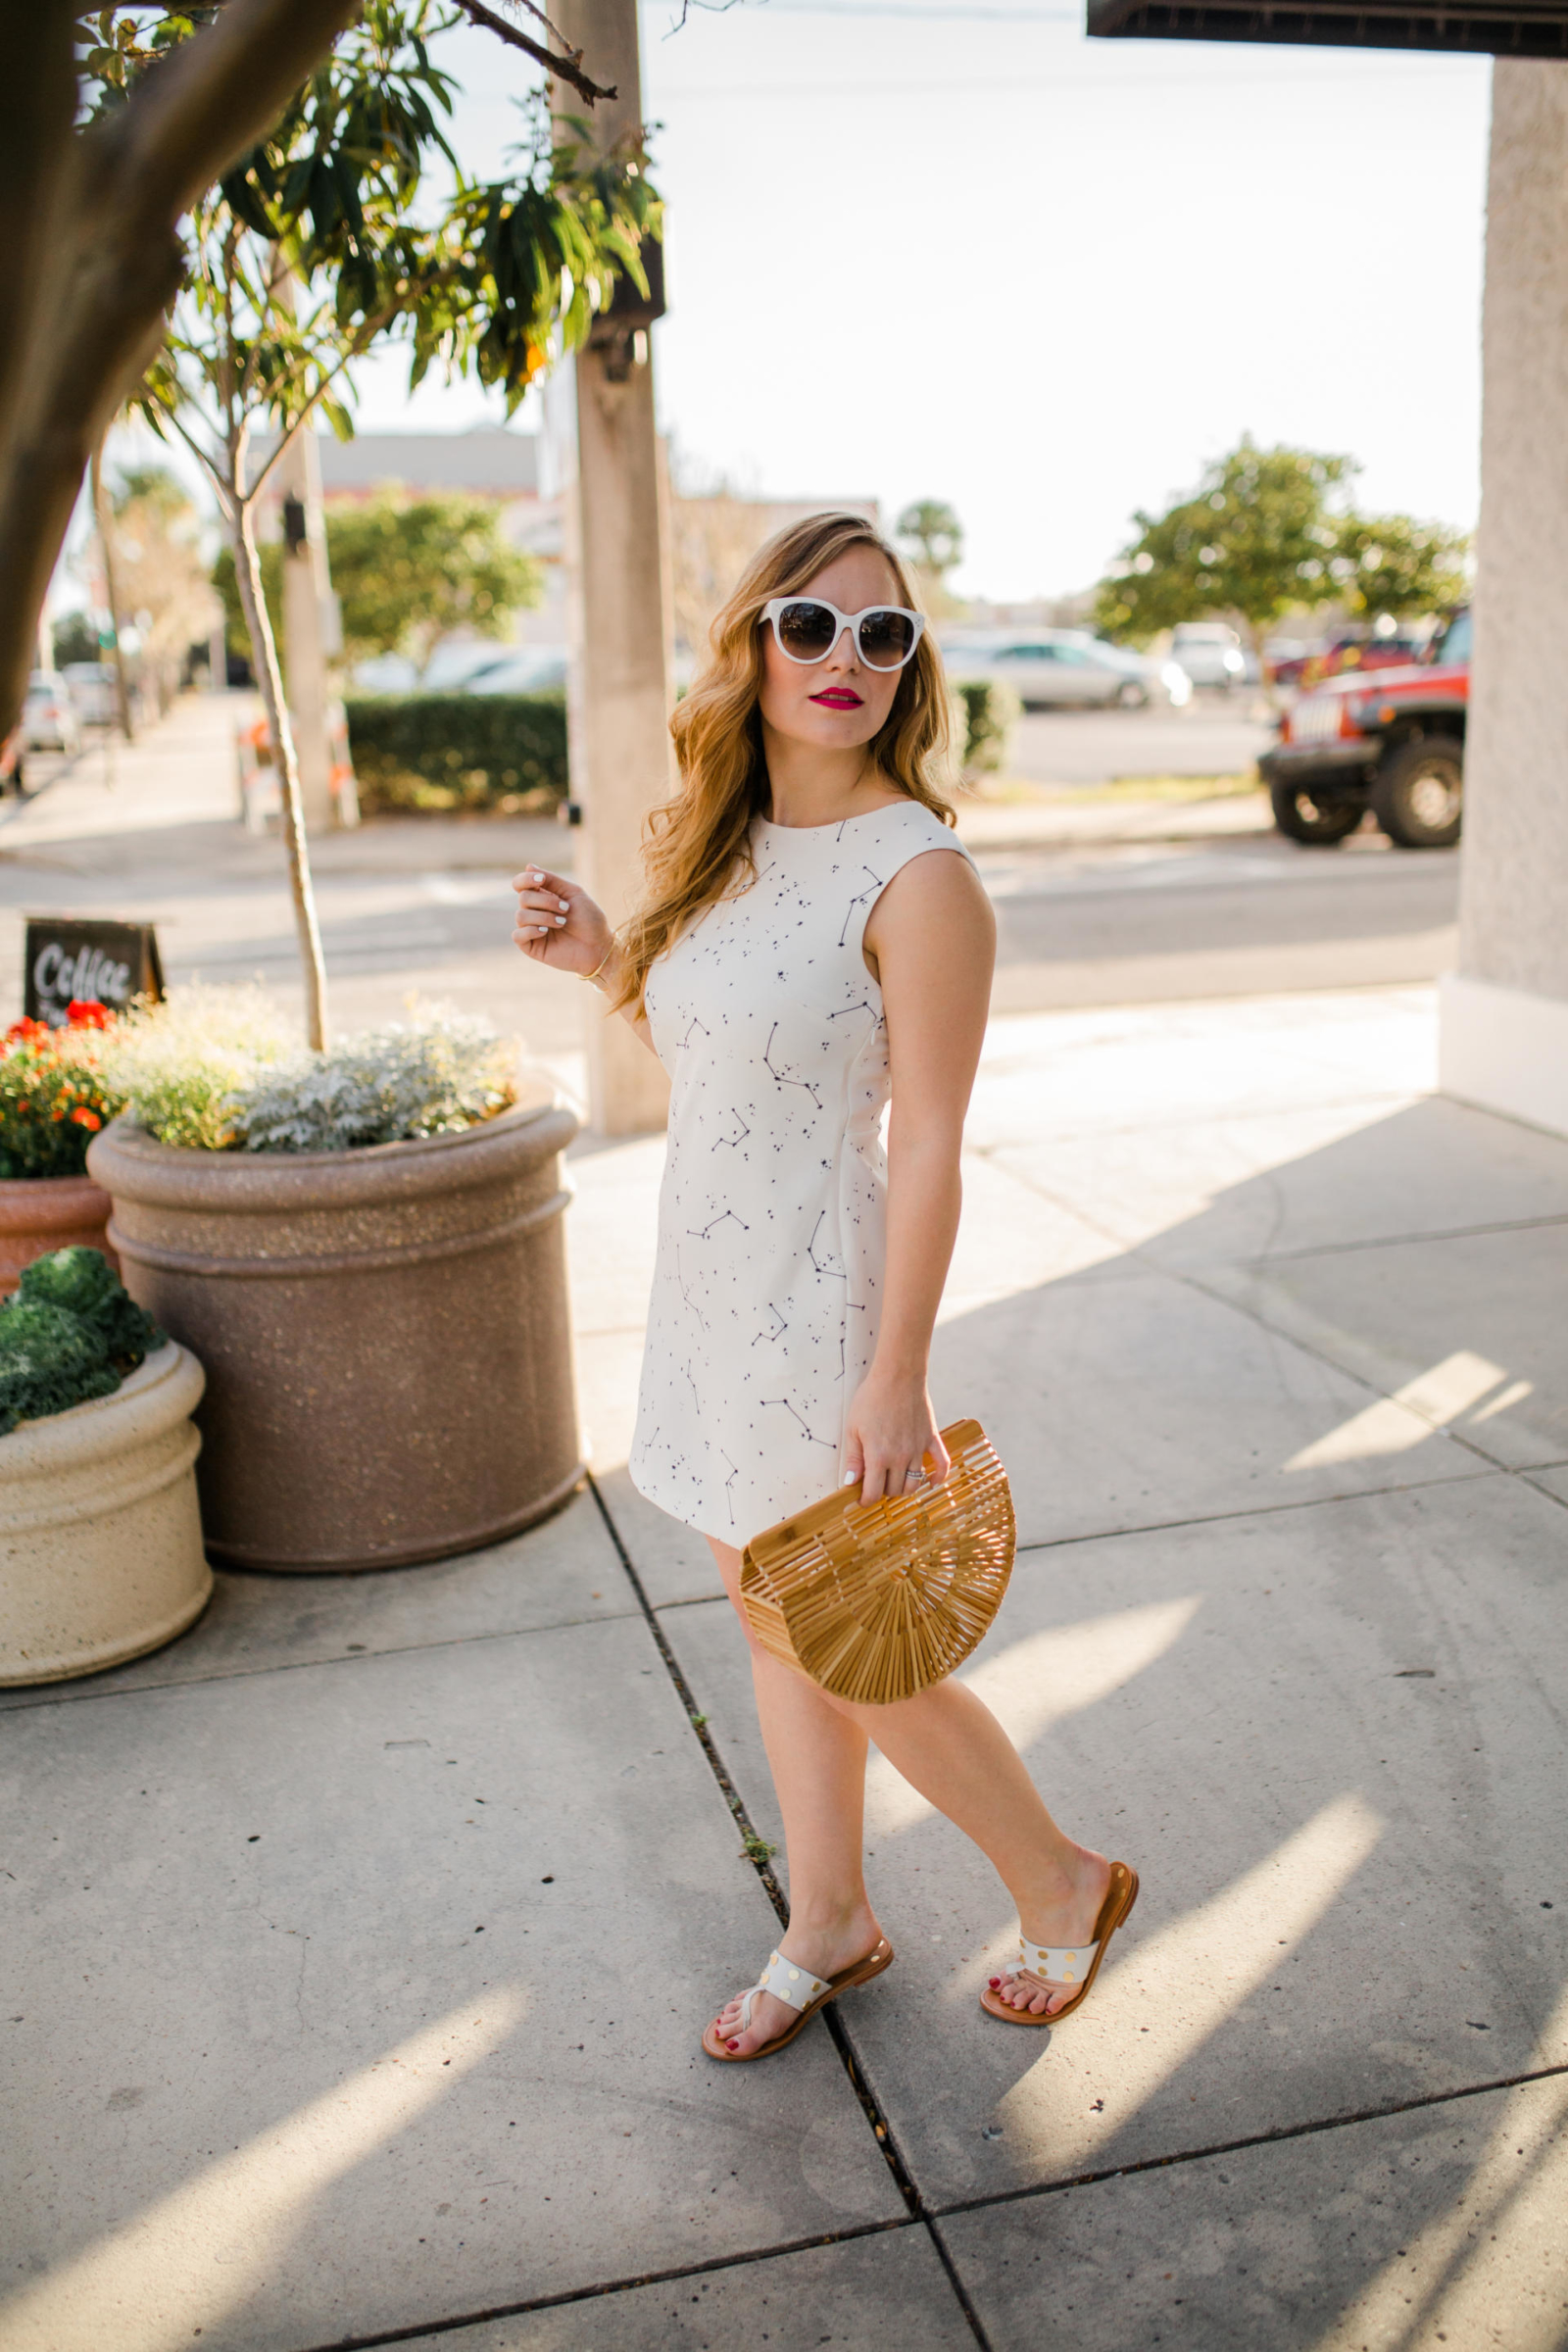 Florida White MIni Dress Vacation Outfit Inspiration